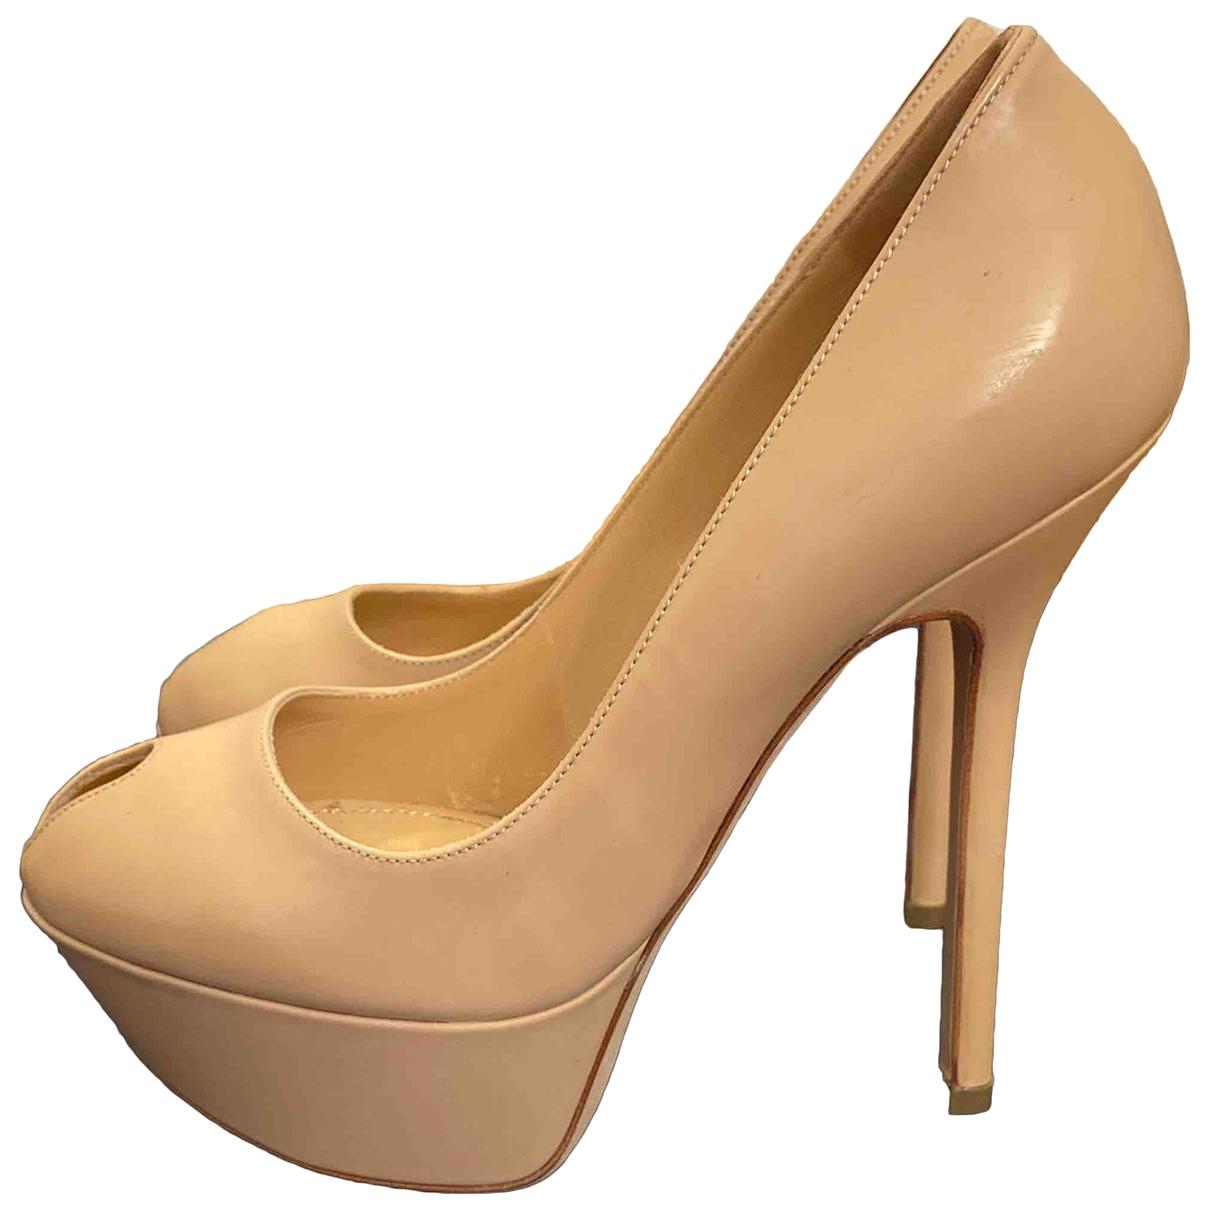 Sergio Rossi \N Beige Leather Heels for Women 34 EU